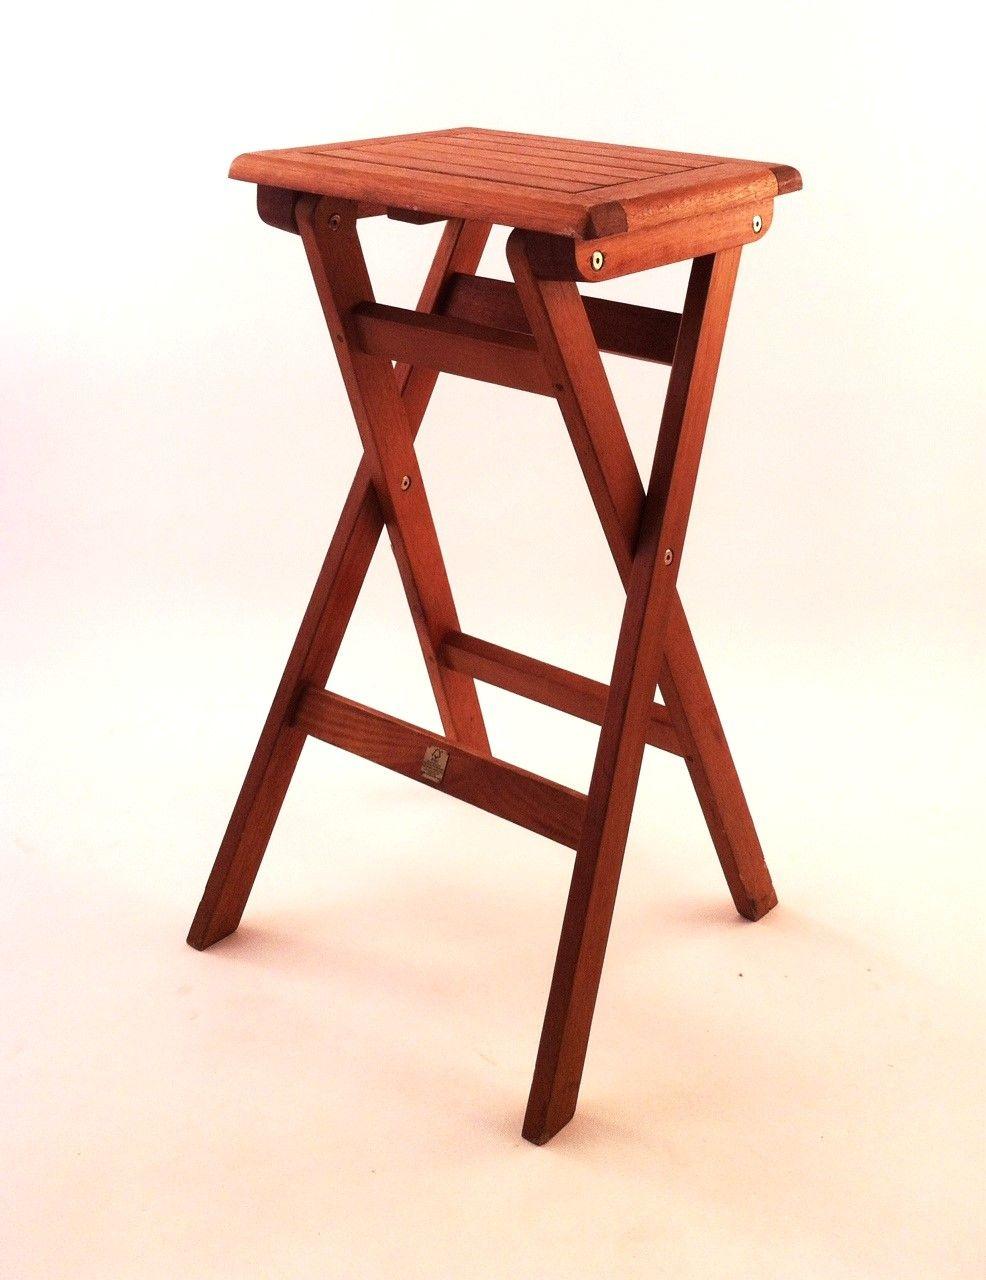 Making Wood Folding Bar Stools Http Www 1sthomebarideas Barstools A Stool Is Easy To Make